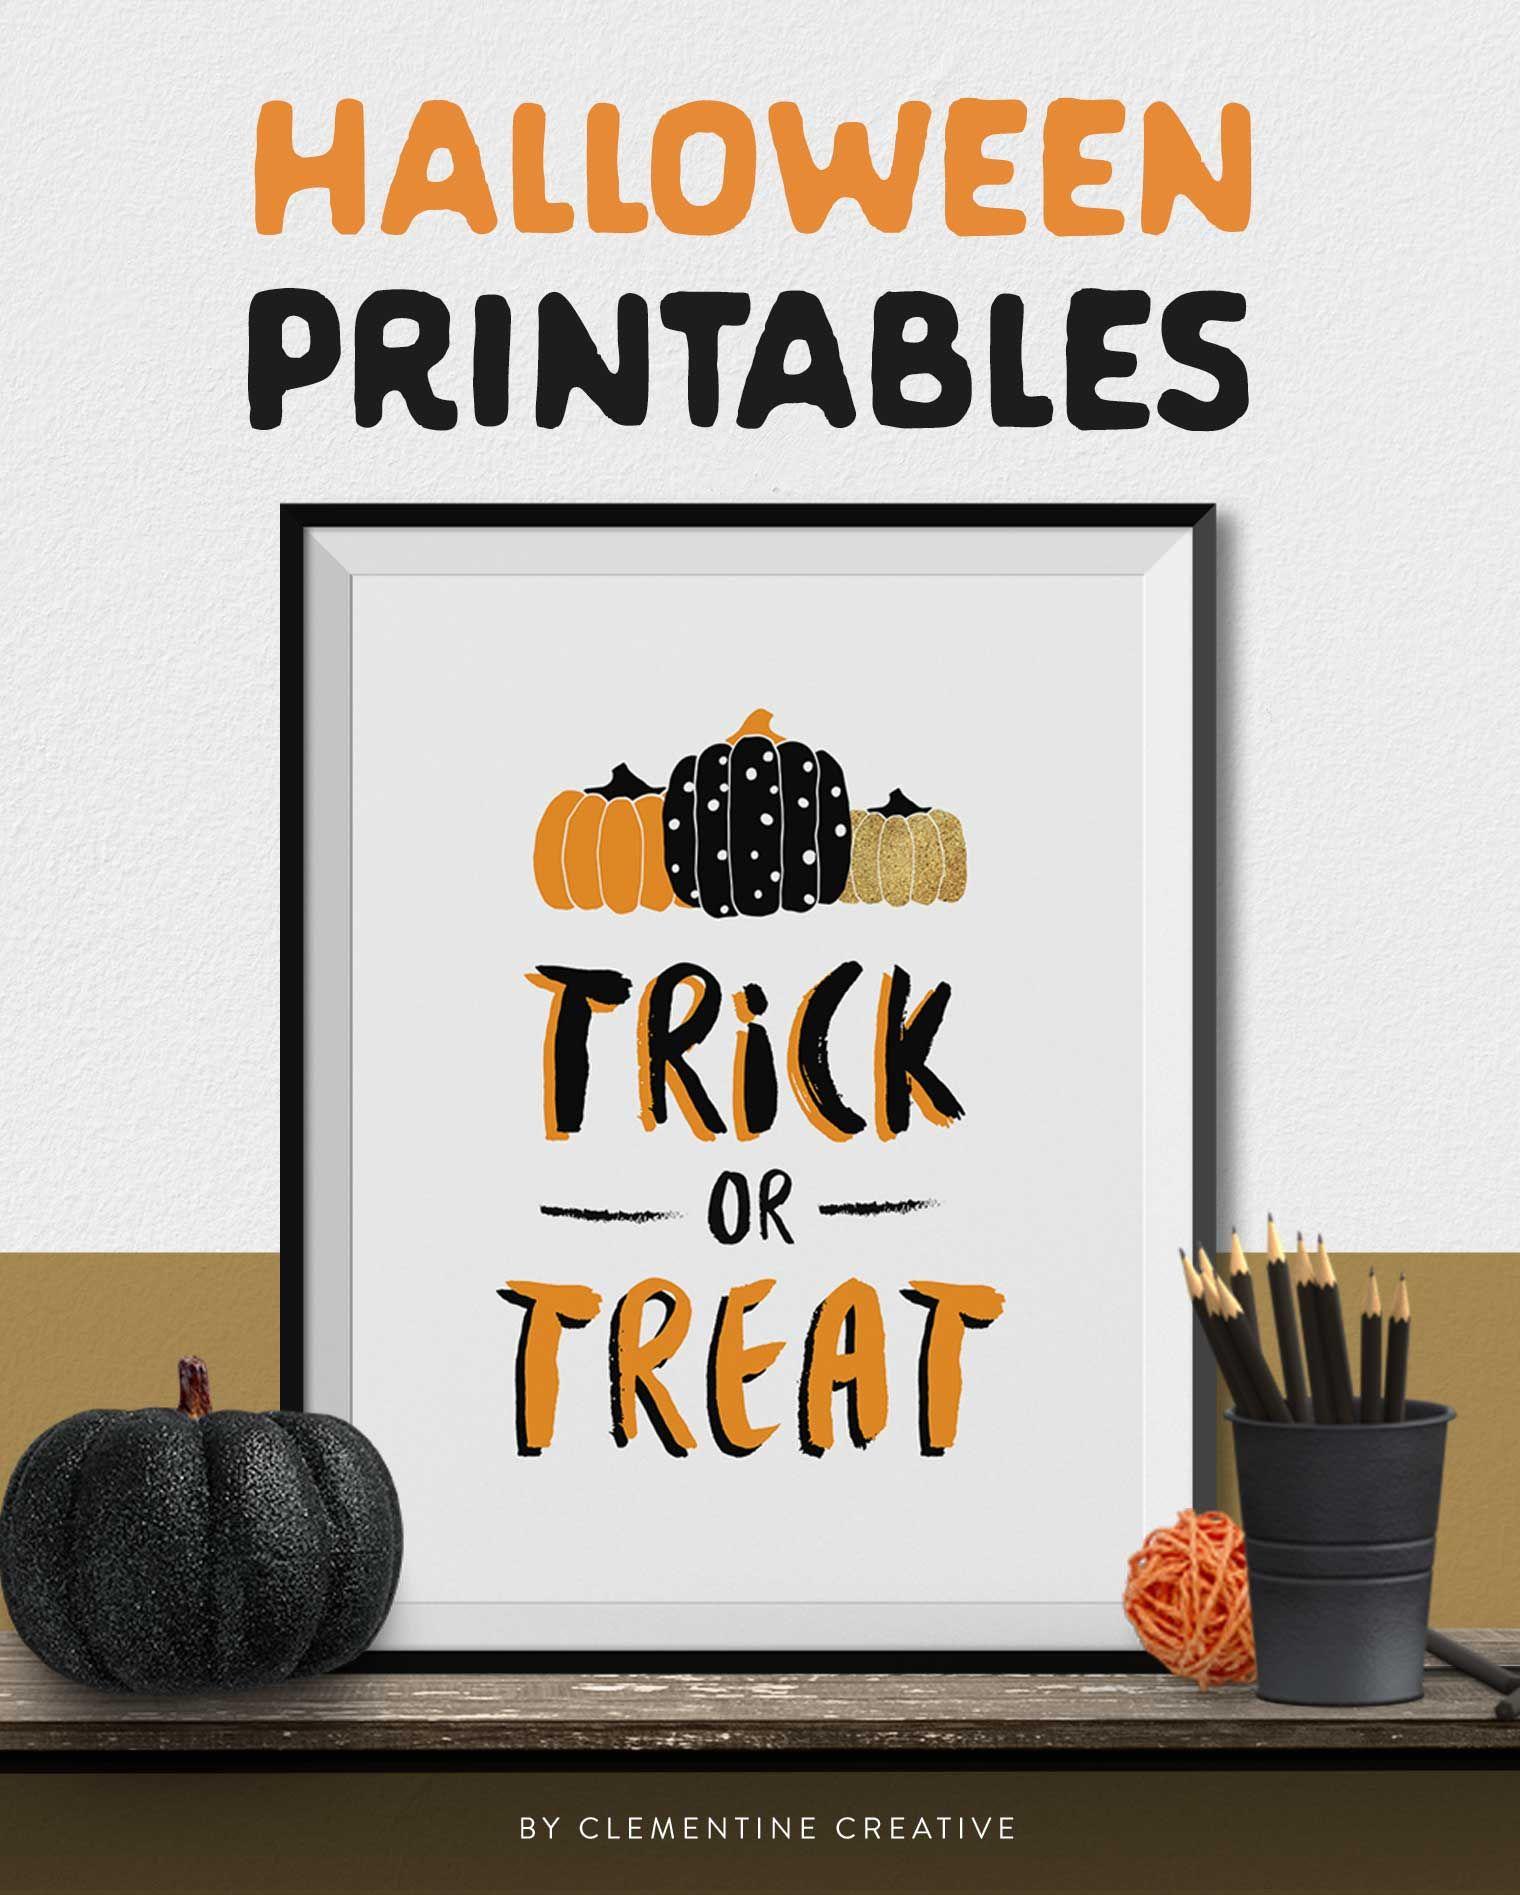 Free Printable Halloween Wall Art Modern Prints For Your Halloween Decor Halloween Wall Art Halloween Labels Printable Halloween Printables